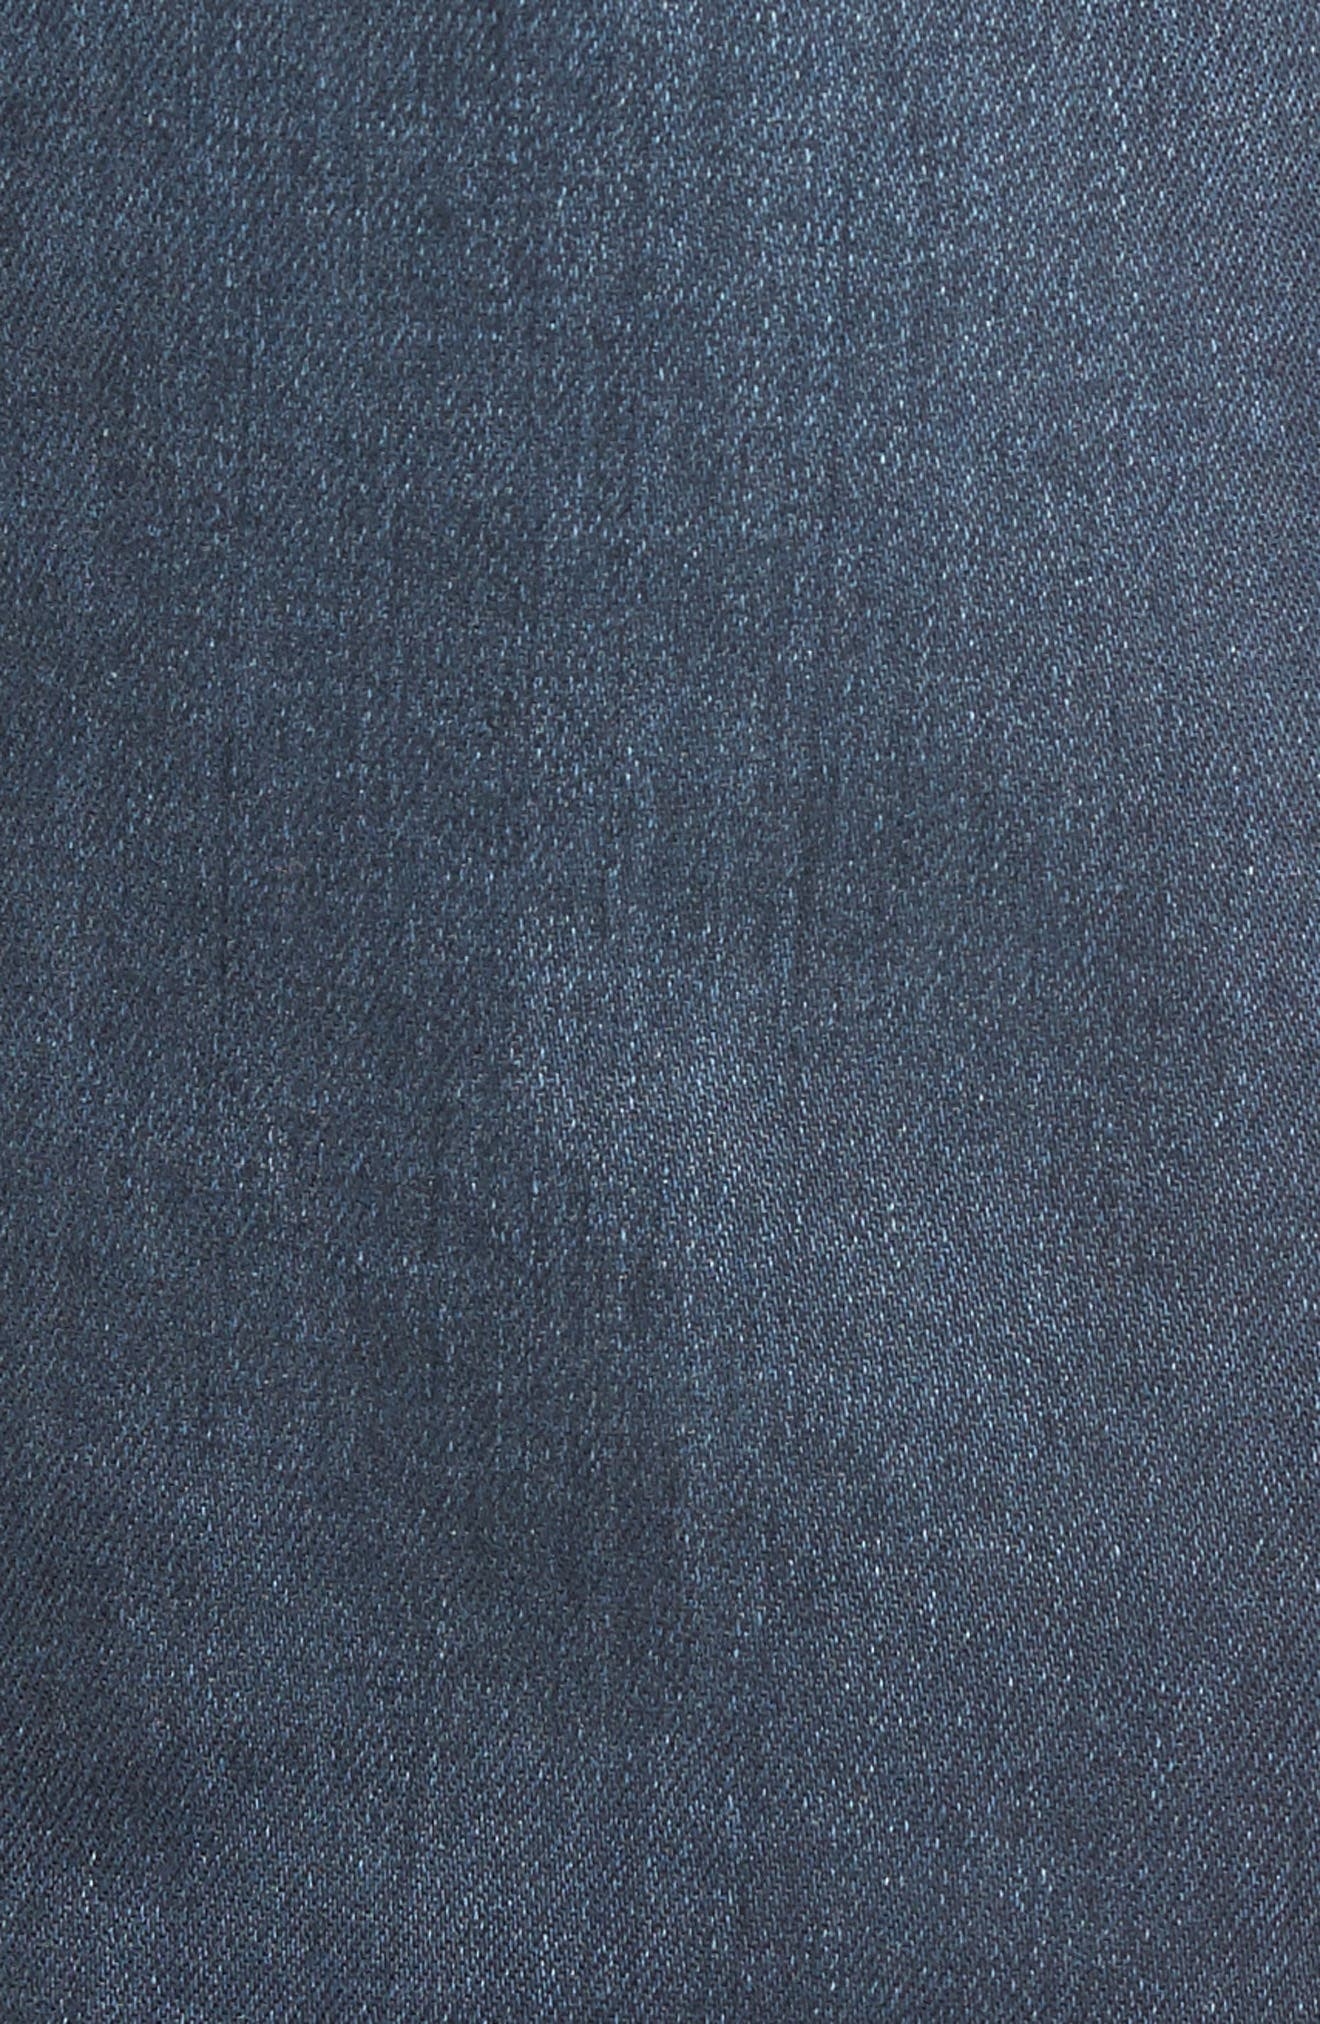 Graduate Slim Straight Leg Jeans,                             Alternate thumbnail 5, color,                             7 YEARS BLUE PERIL